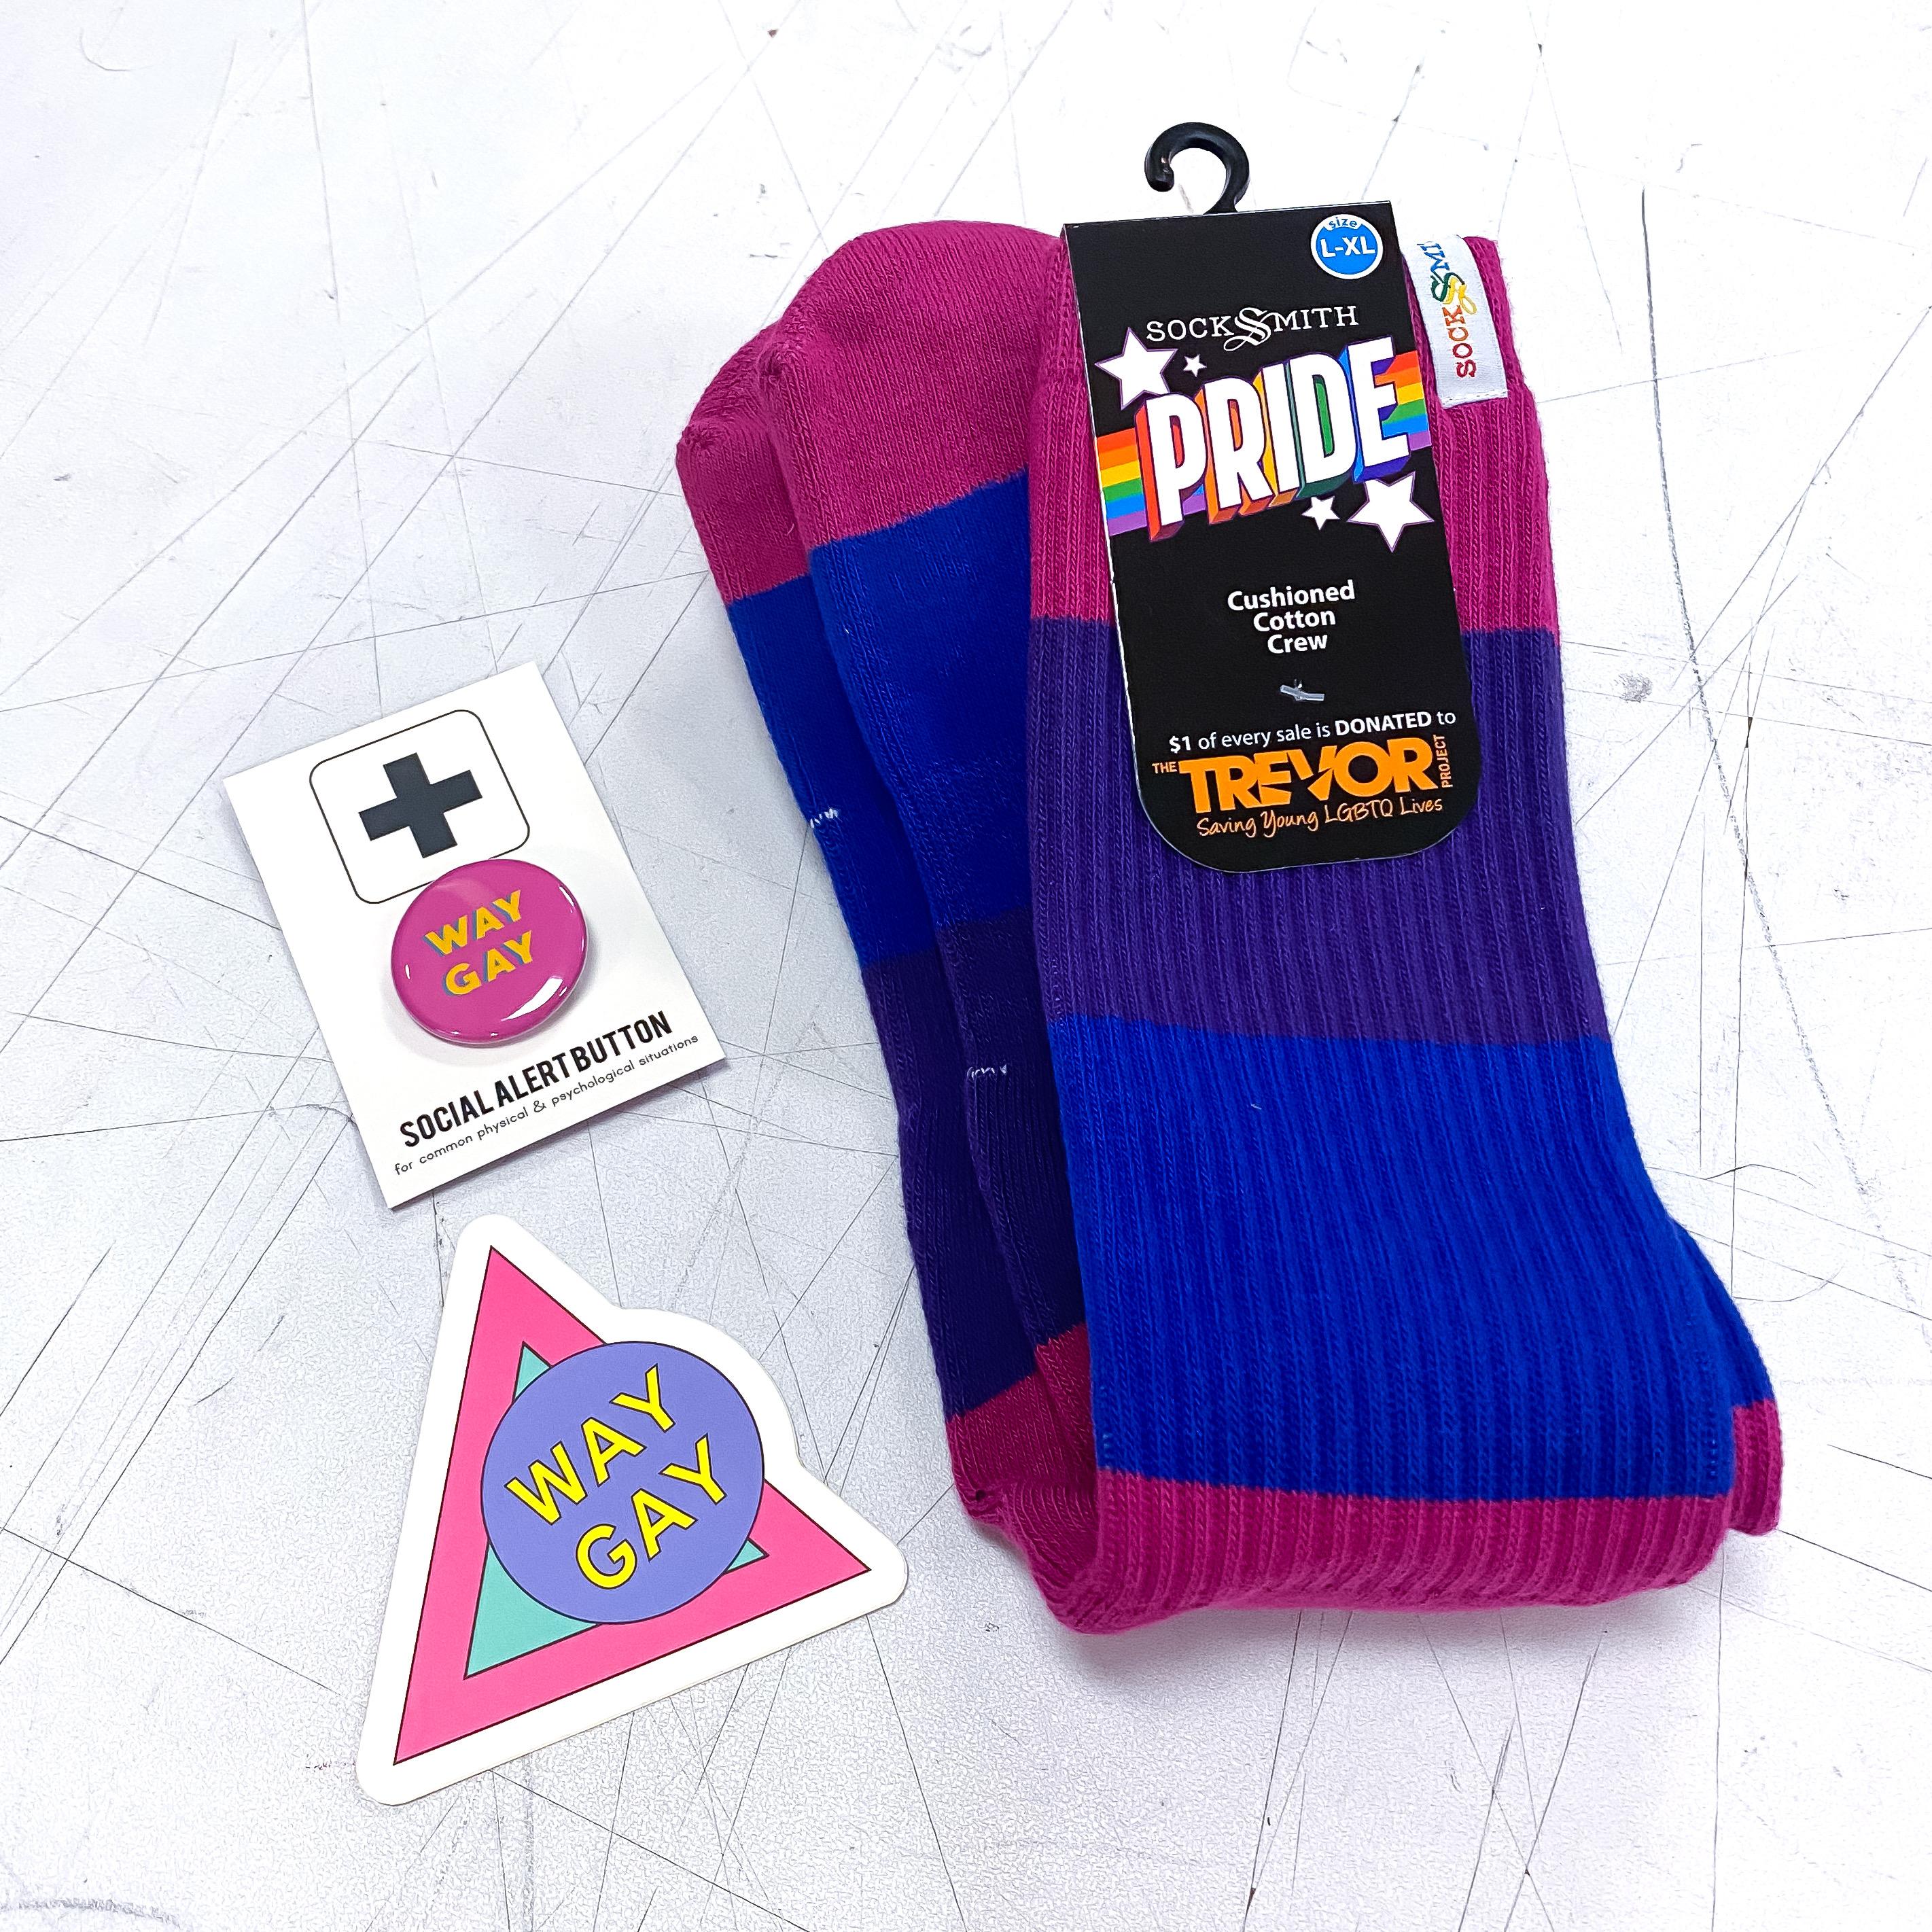 Way Gay Bi Pride Kit!